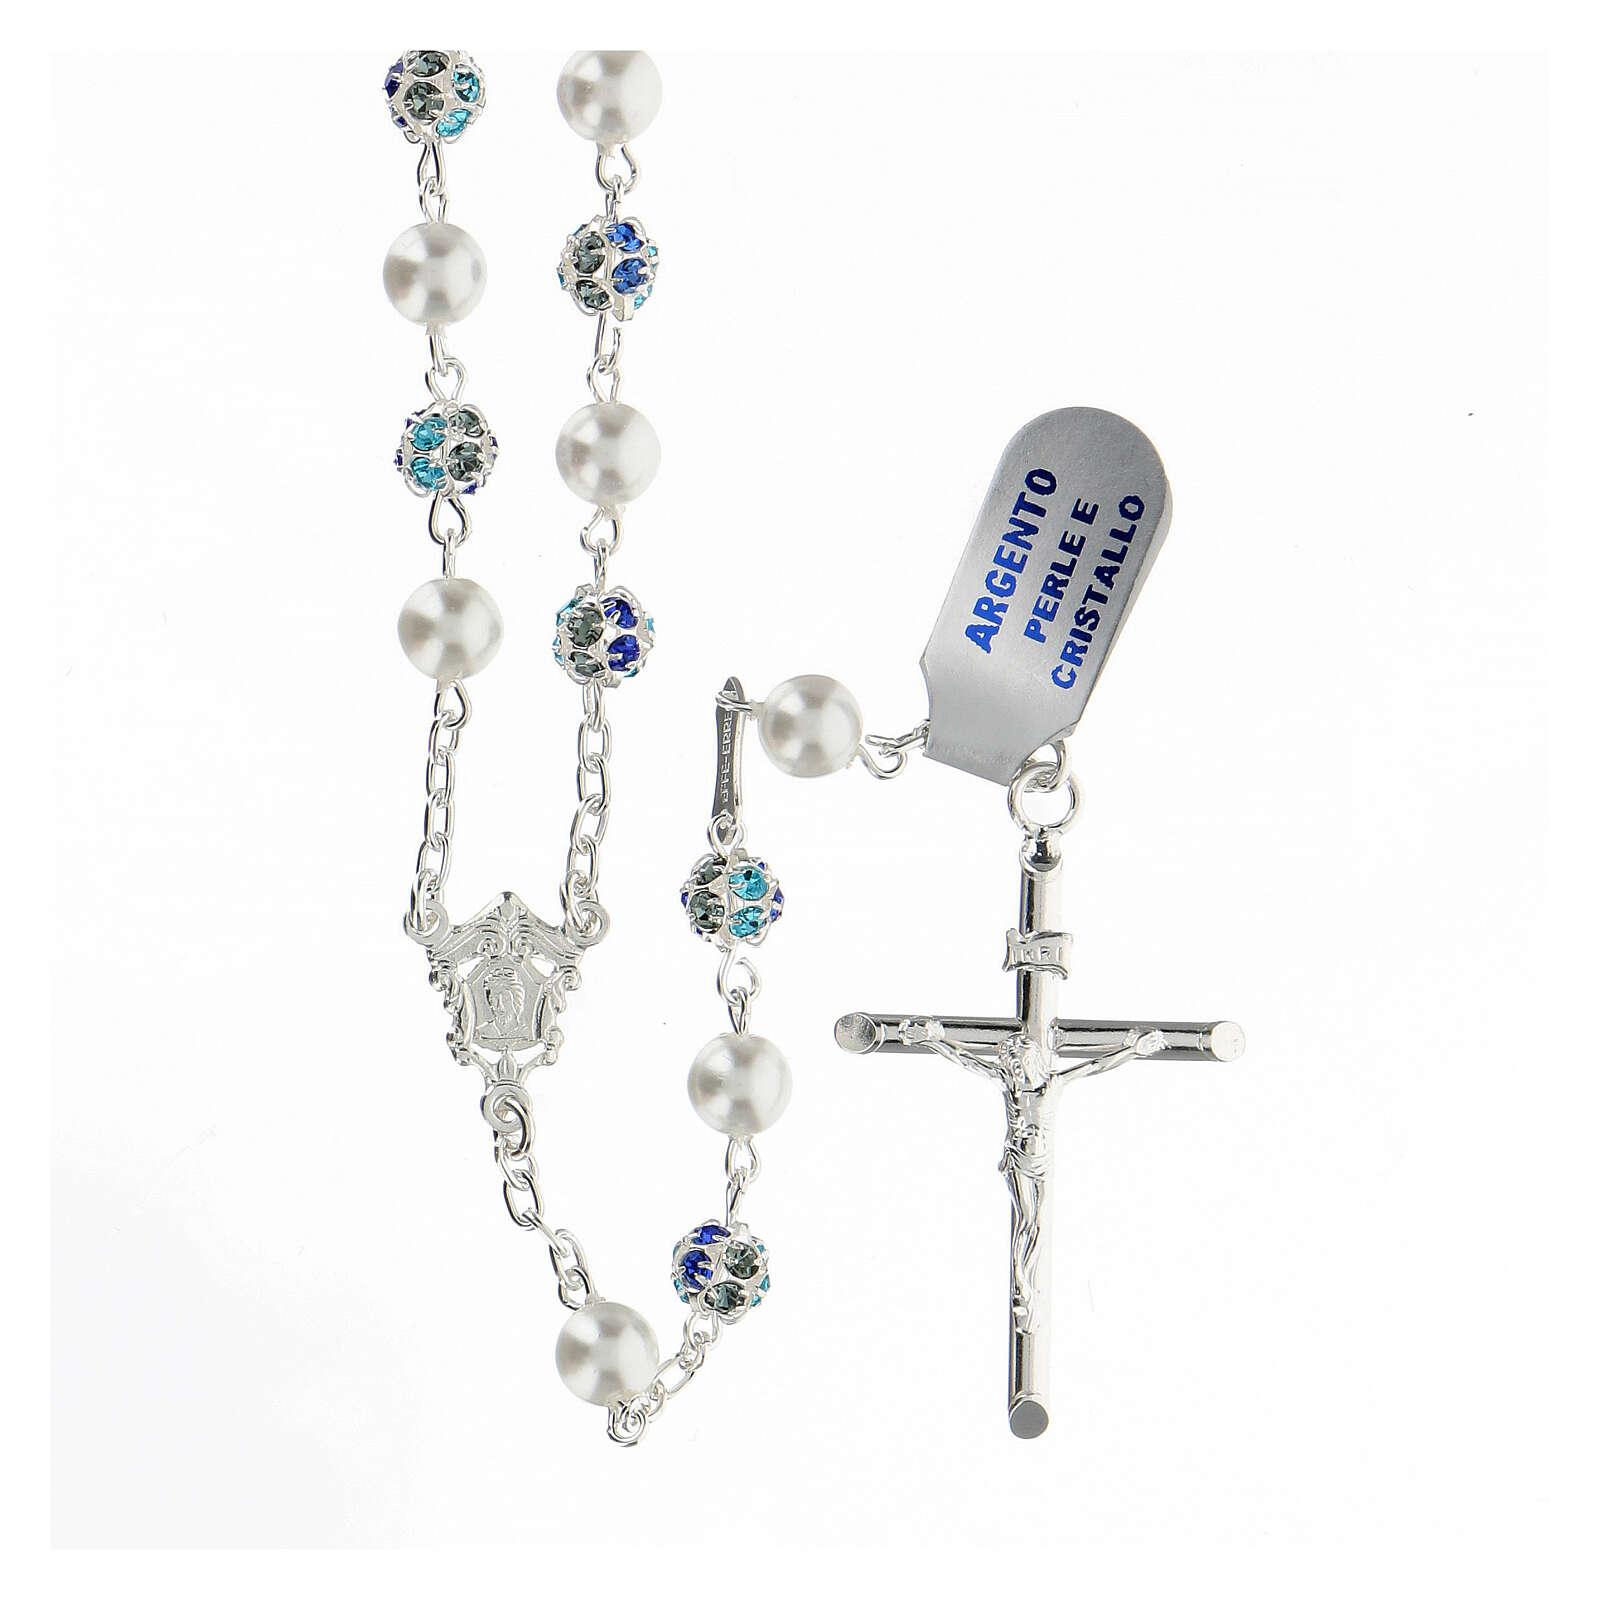 Chapelet strassball bleus perles 6 mm argent 925 4